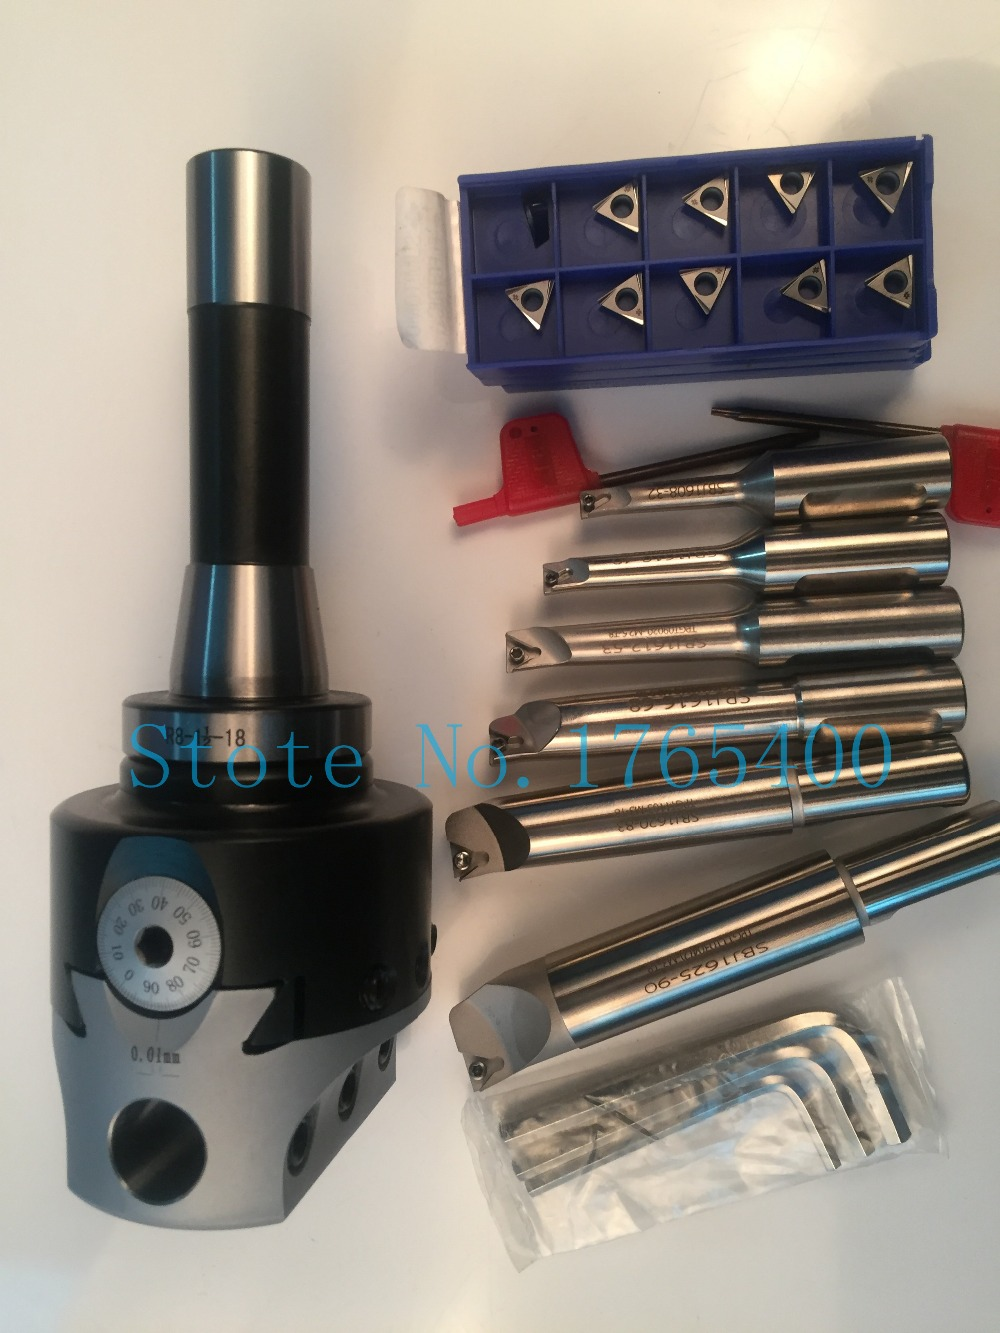 New R8 7/16 arbor  F1 -12 50mm boring head & shank 12mm 6pcs borng bars & 10pcs carbide insertsNew R8 7/16 arbor  F1 -12 50mm boring head & shank 12mm 6pcs borng bars & 10pcs carbide inserts